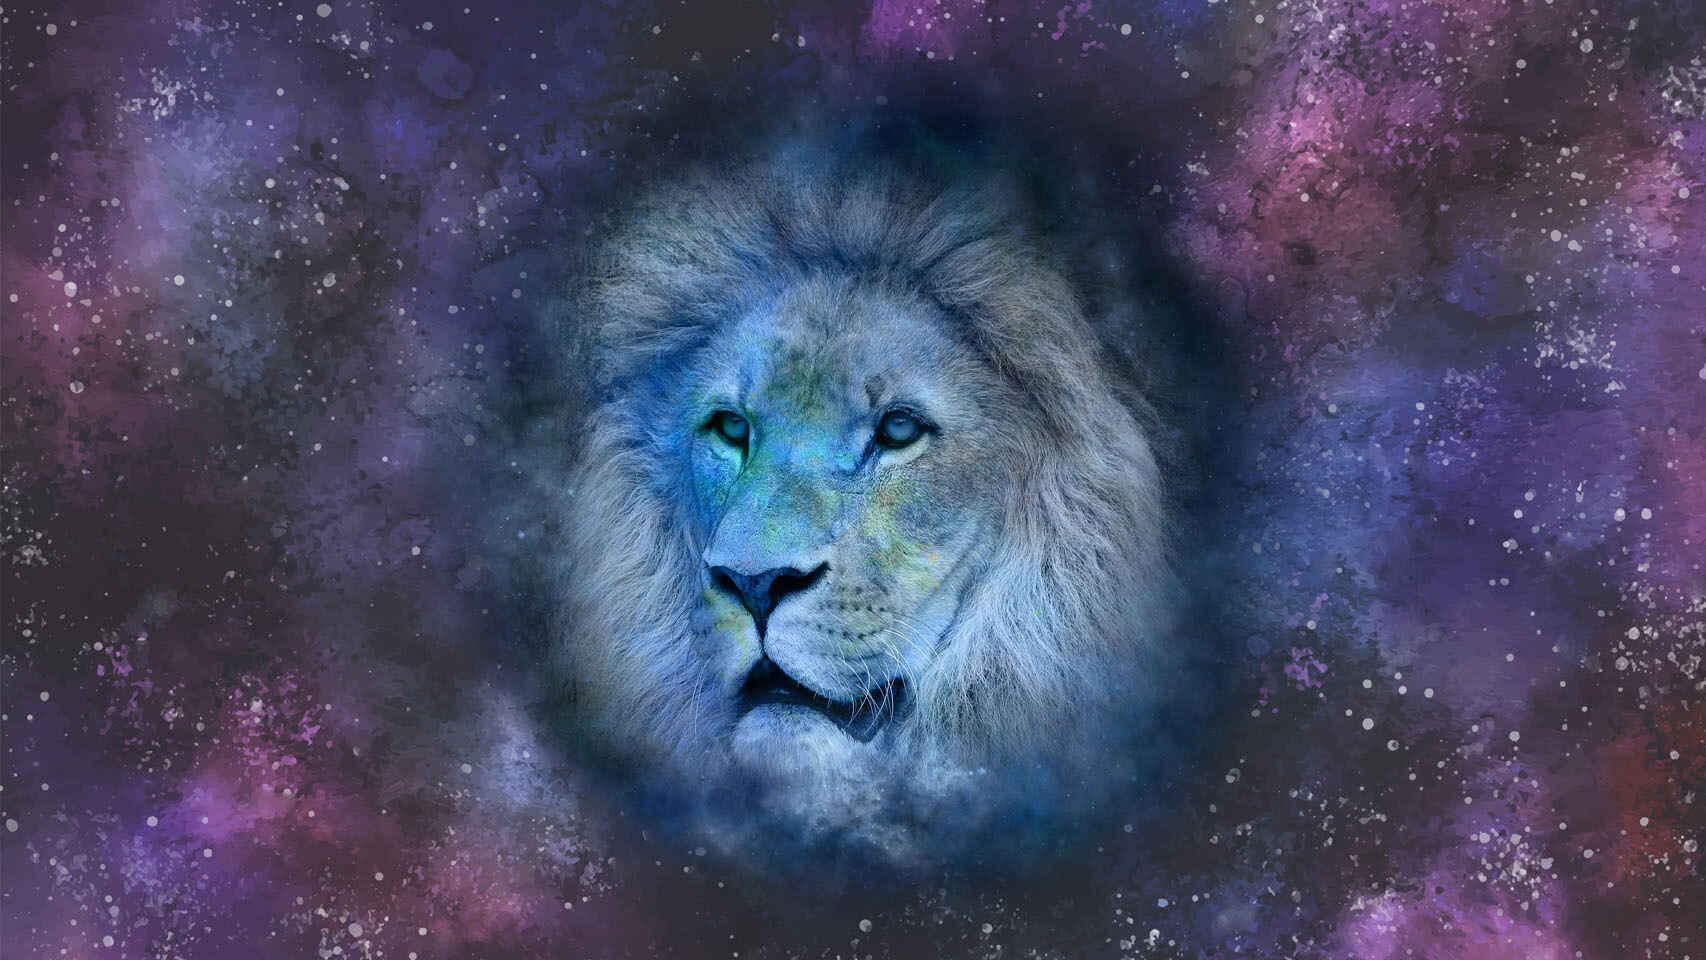 leo-zodiac-sign-temperament-and-character